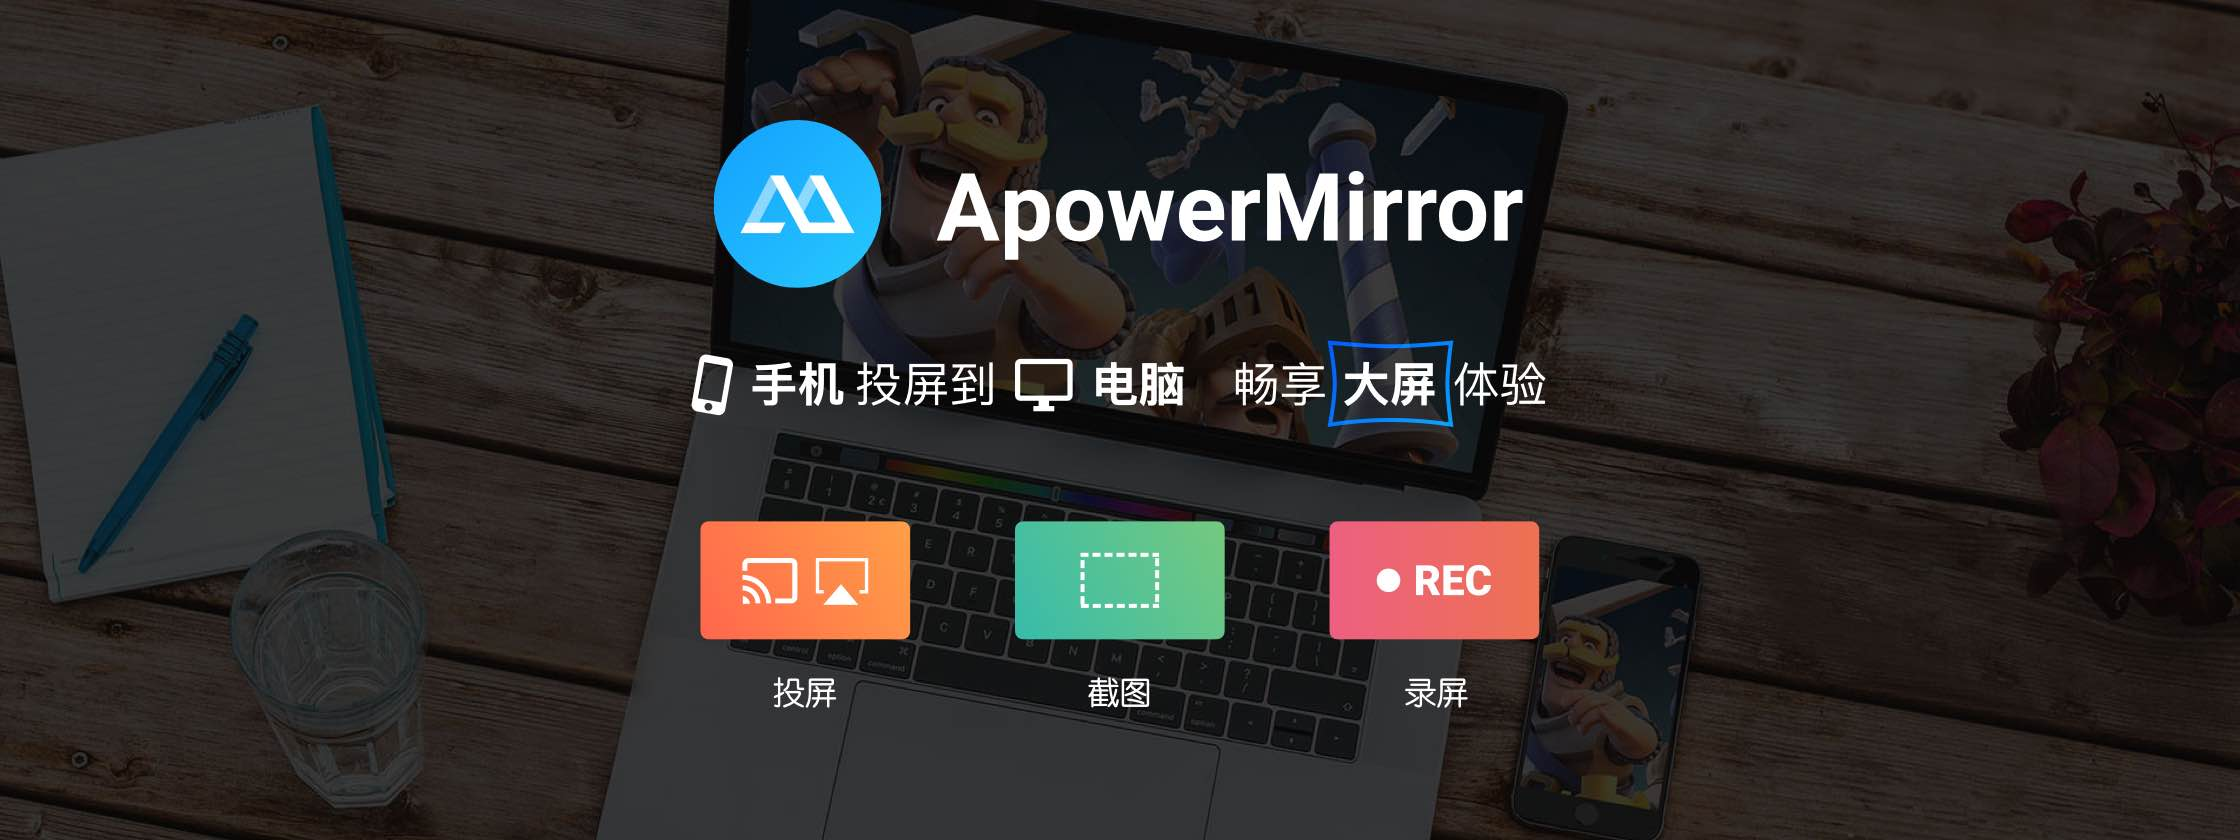 ApowerMirror: 手机投屏到电脑,畅享大屏体验